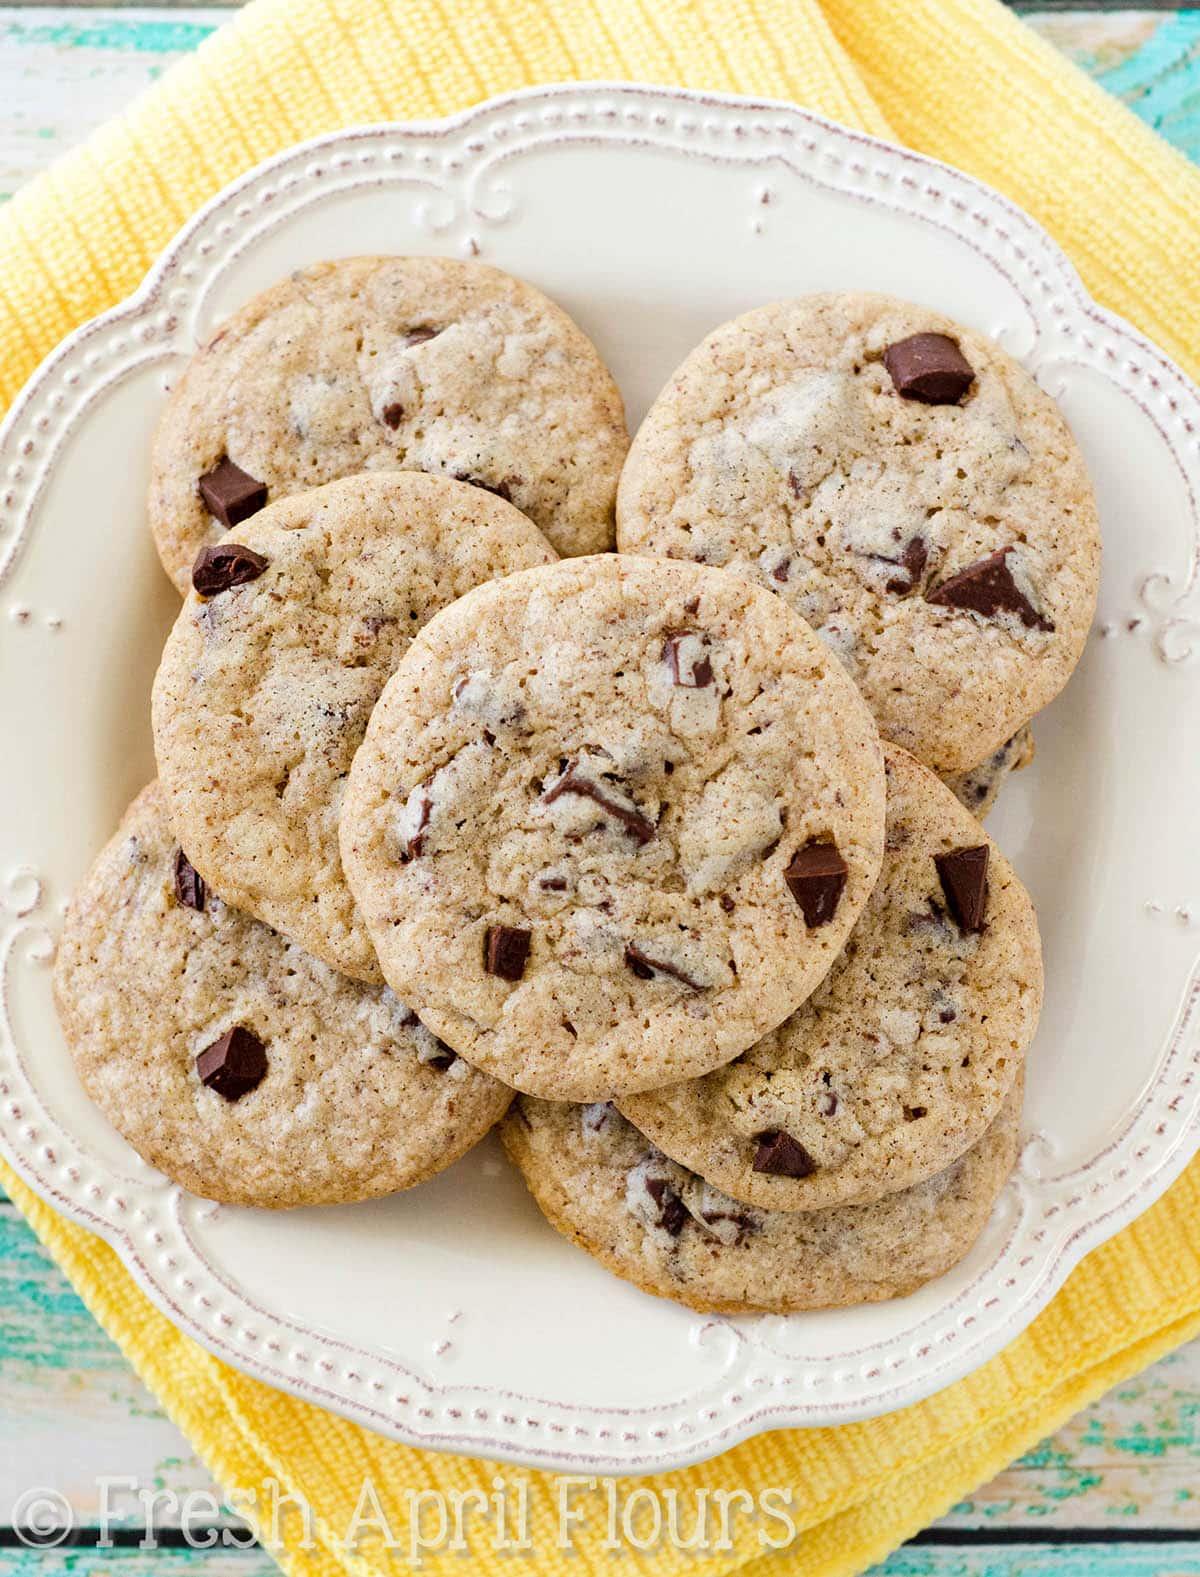 Eggnog Chocolate Chunk Cookies